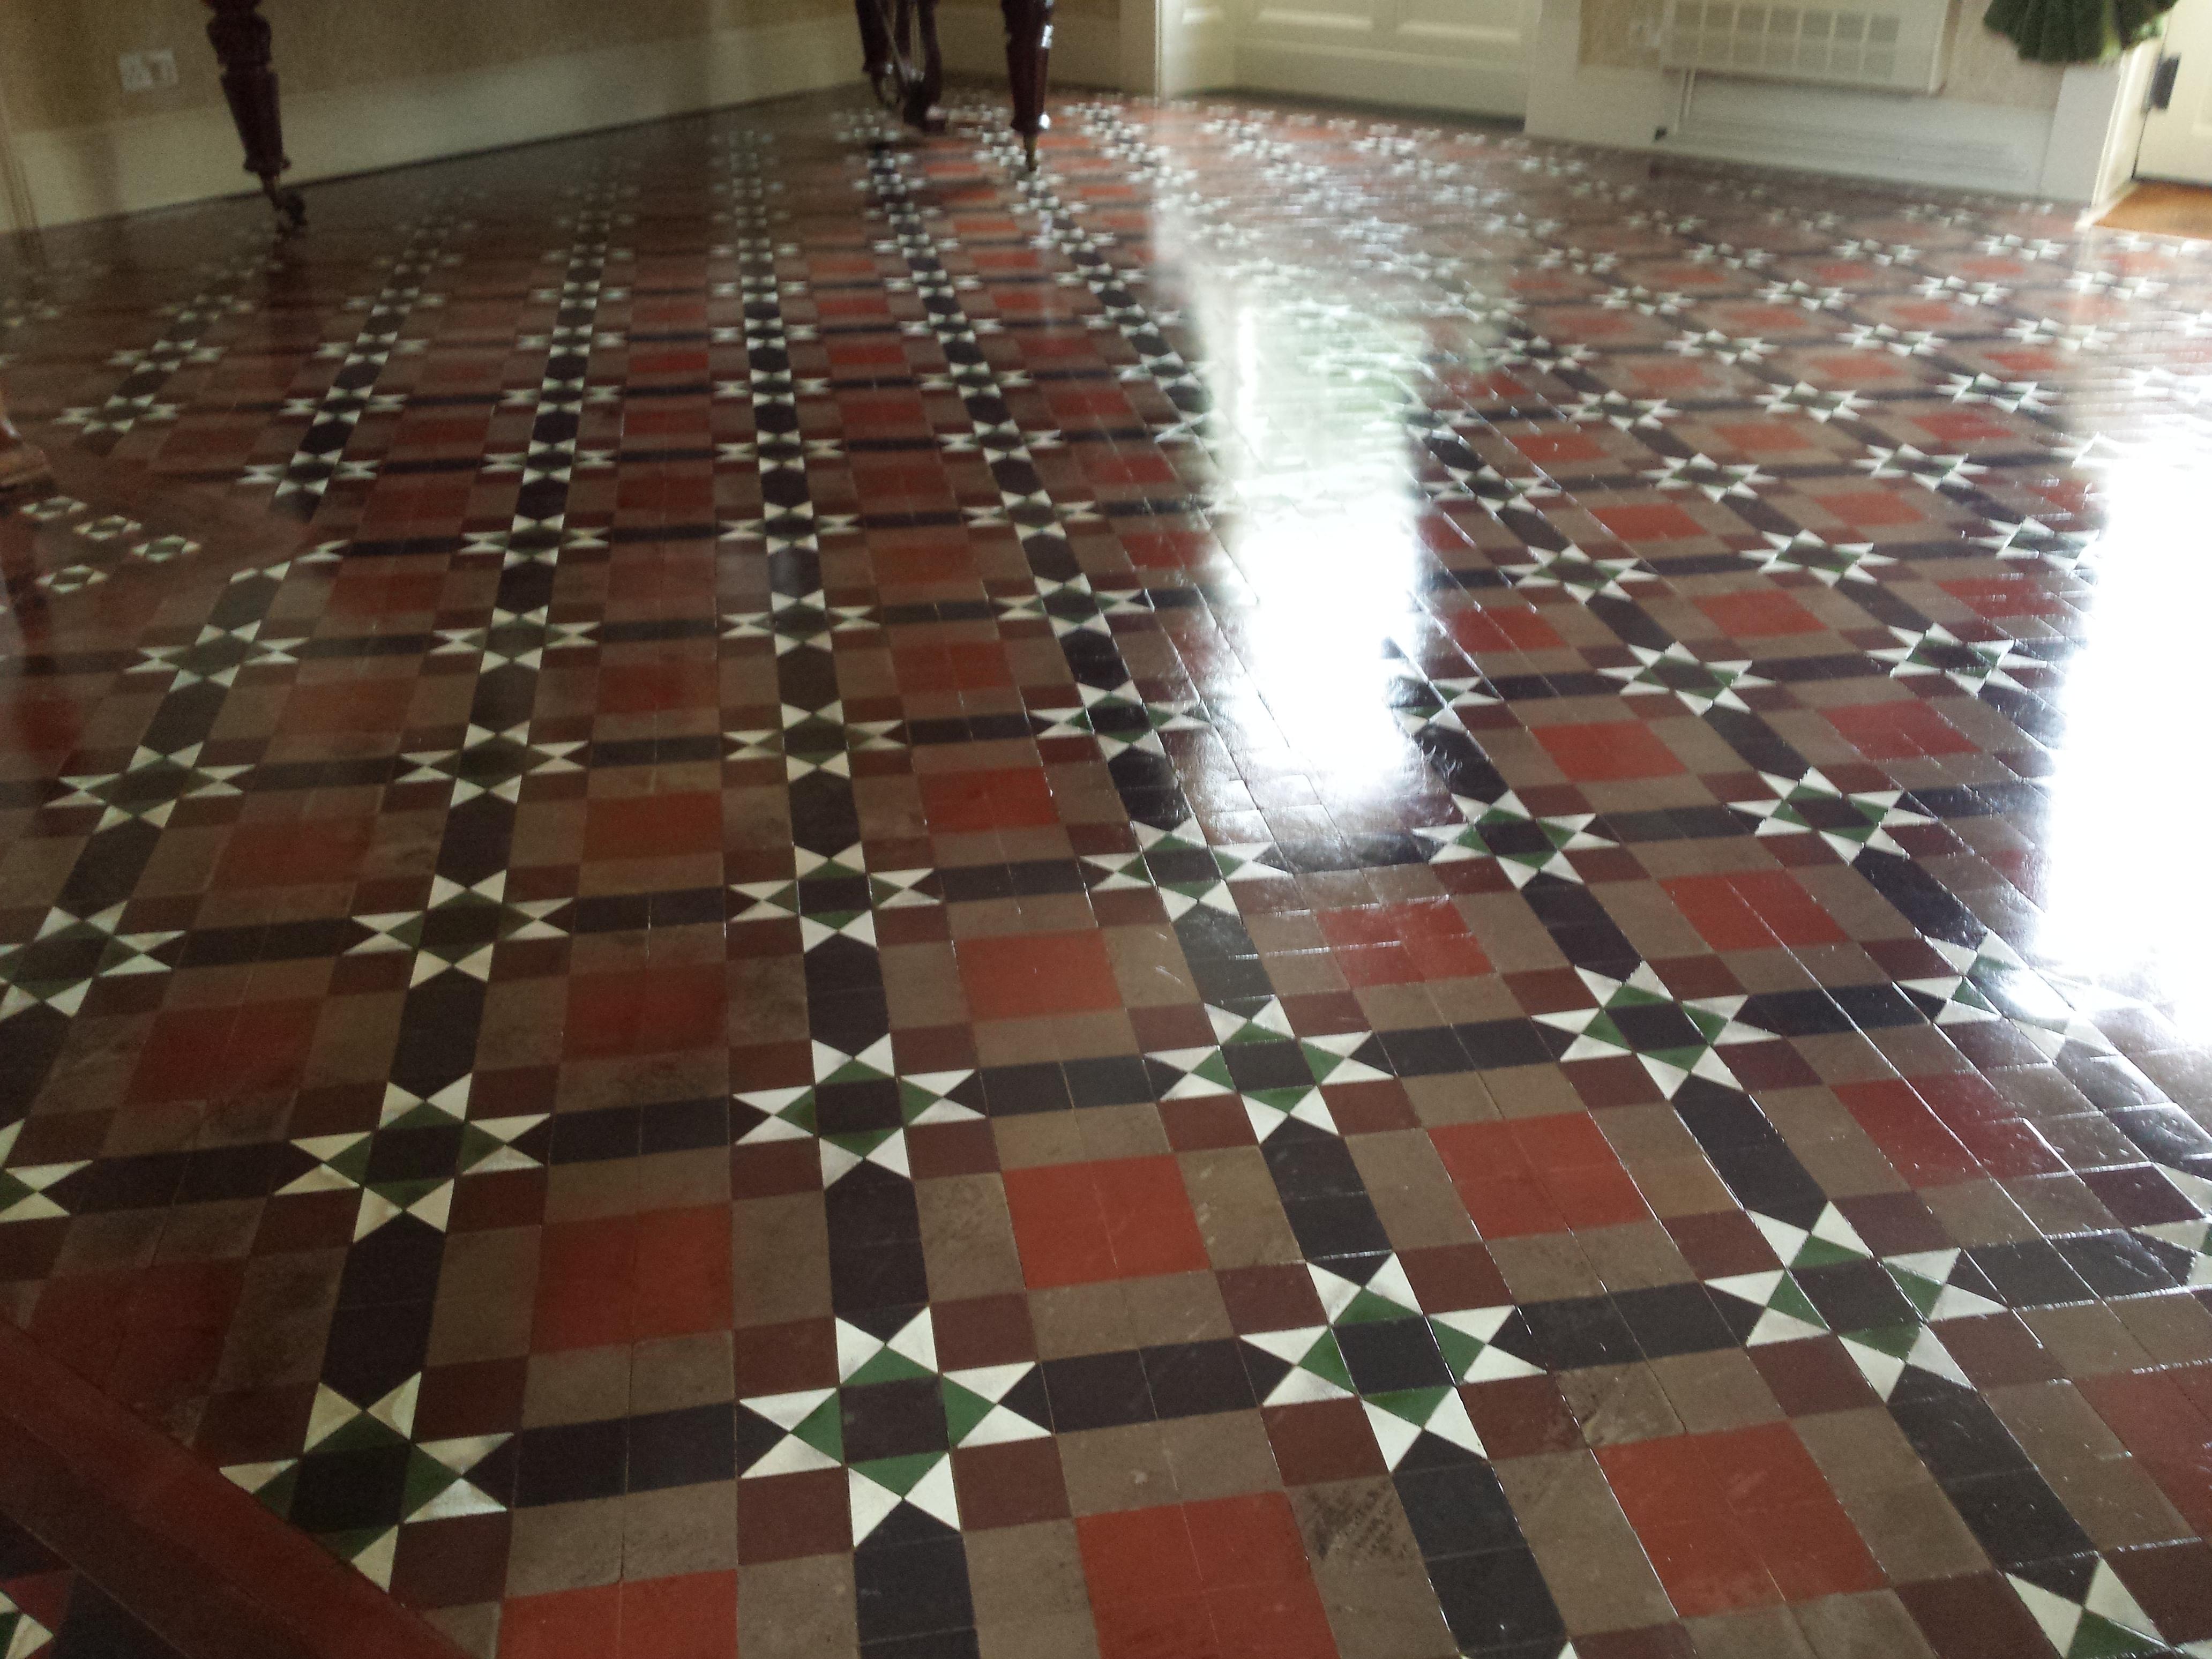 Terracotta quarry tile and victorian tiles floor restore oxford ltd victorian tile floor cleaning oxford from floorrestoreoxford victorian tile cleaning oxford from floorrestoreoxford dailygadgetfo Image collections